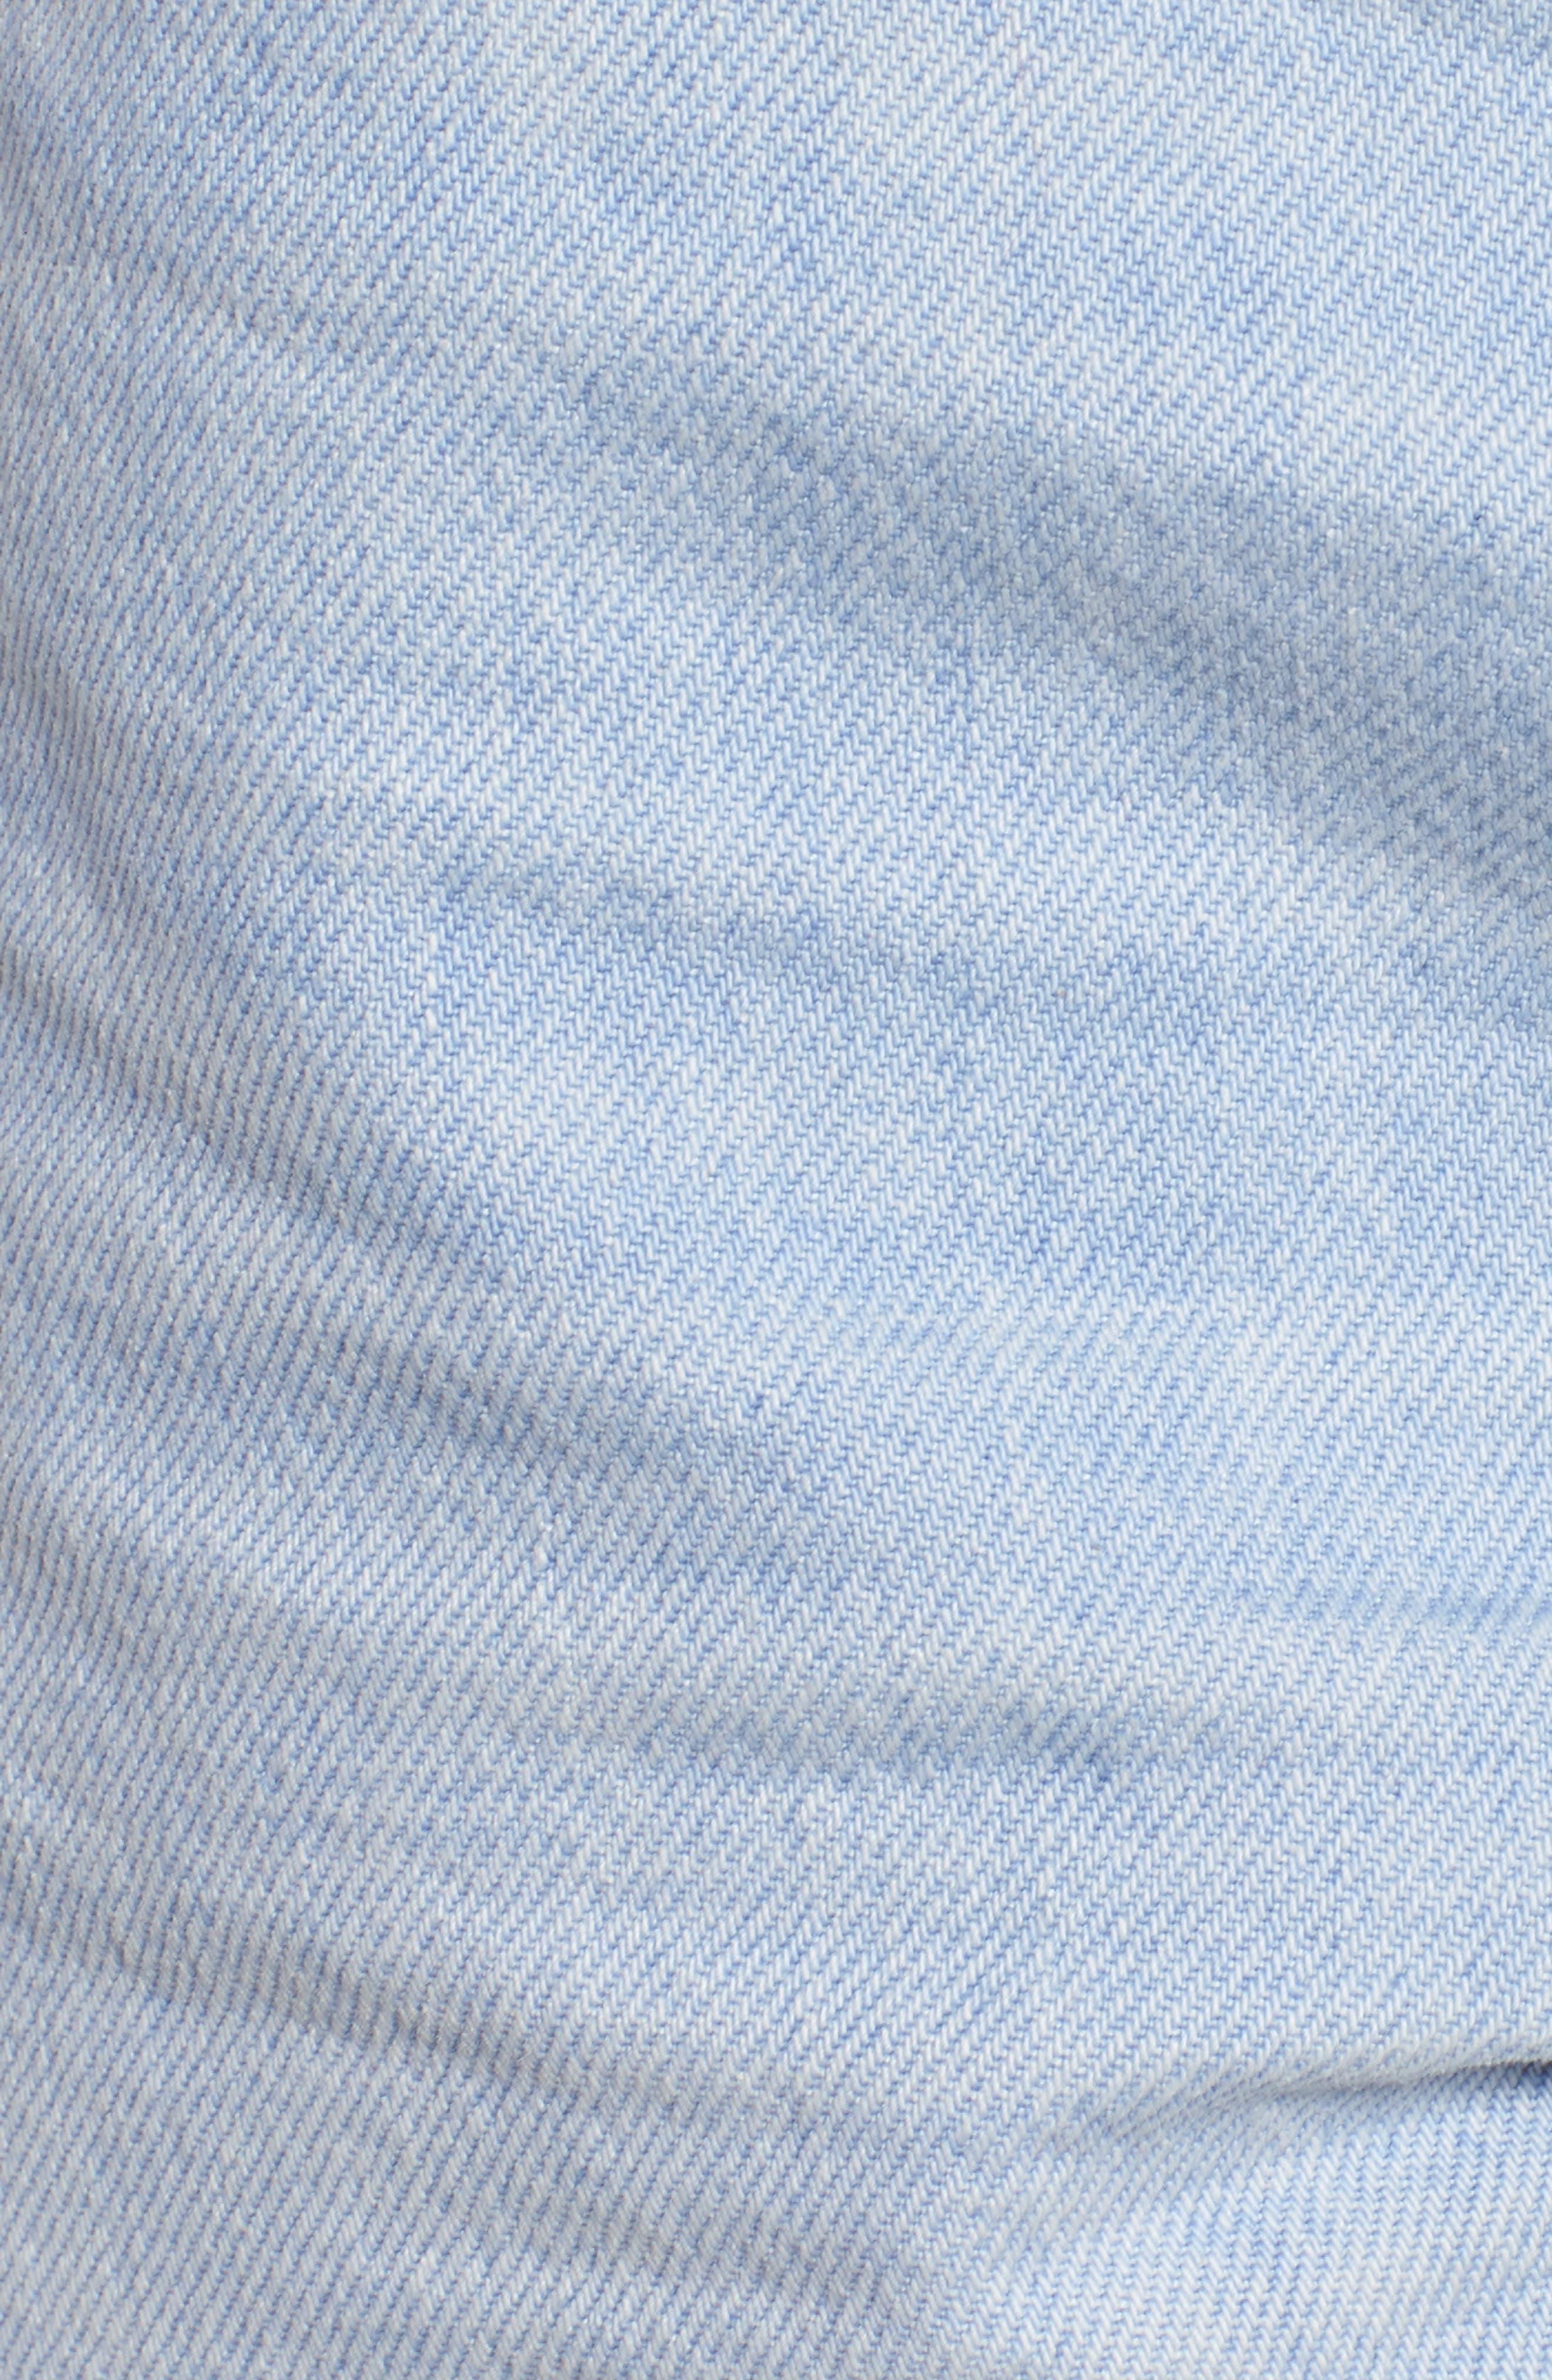 Sade Cutoff Denim Shorts,                             Alternate thumbnail 6, color,                             460